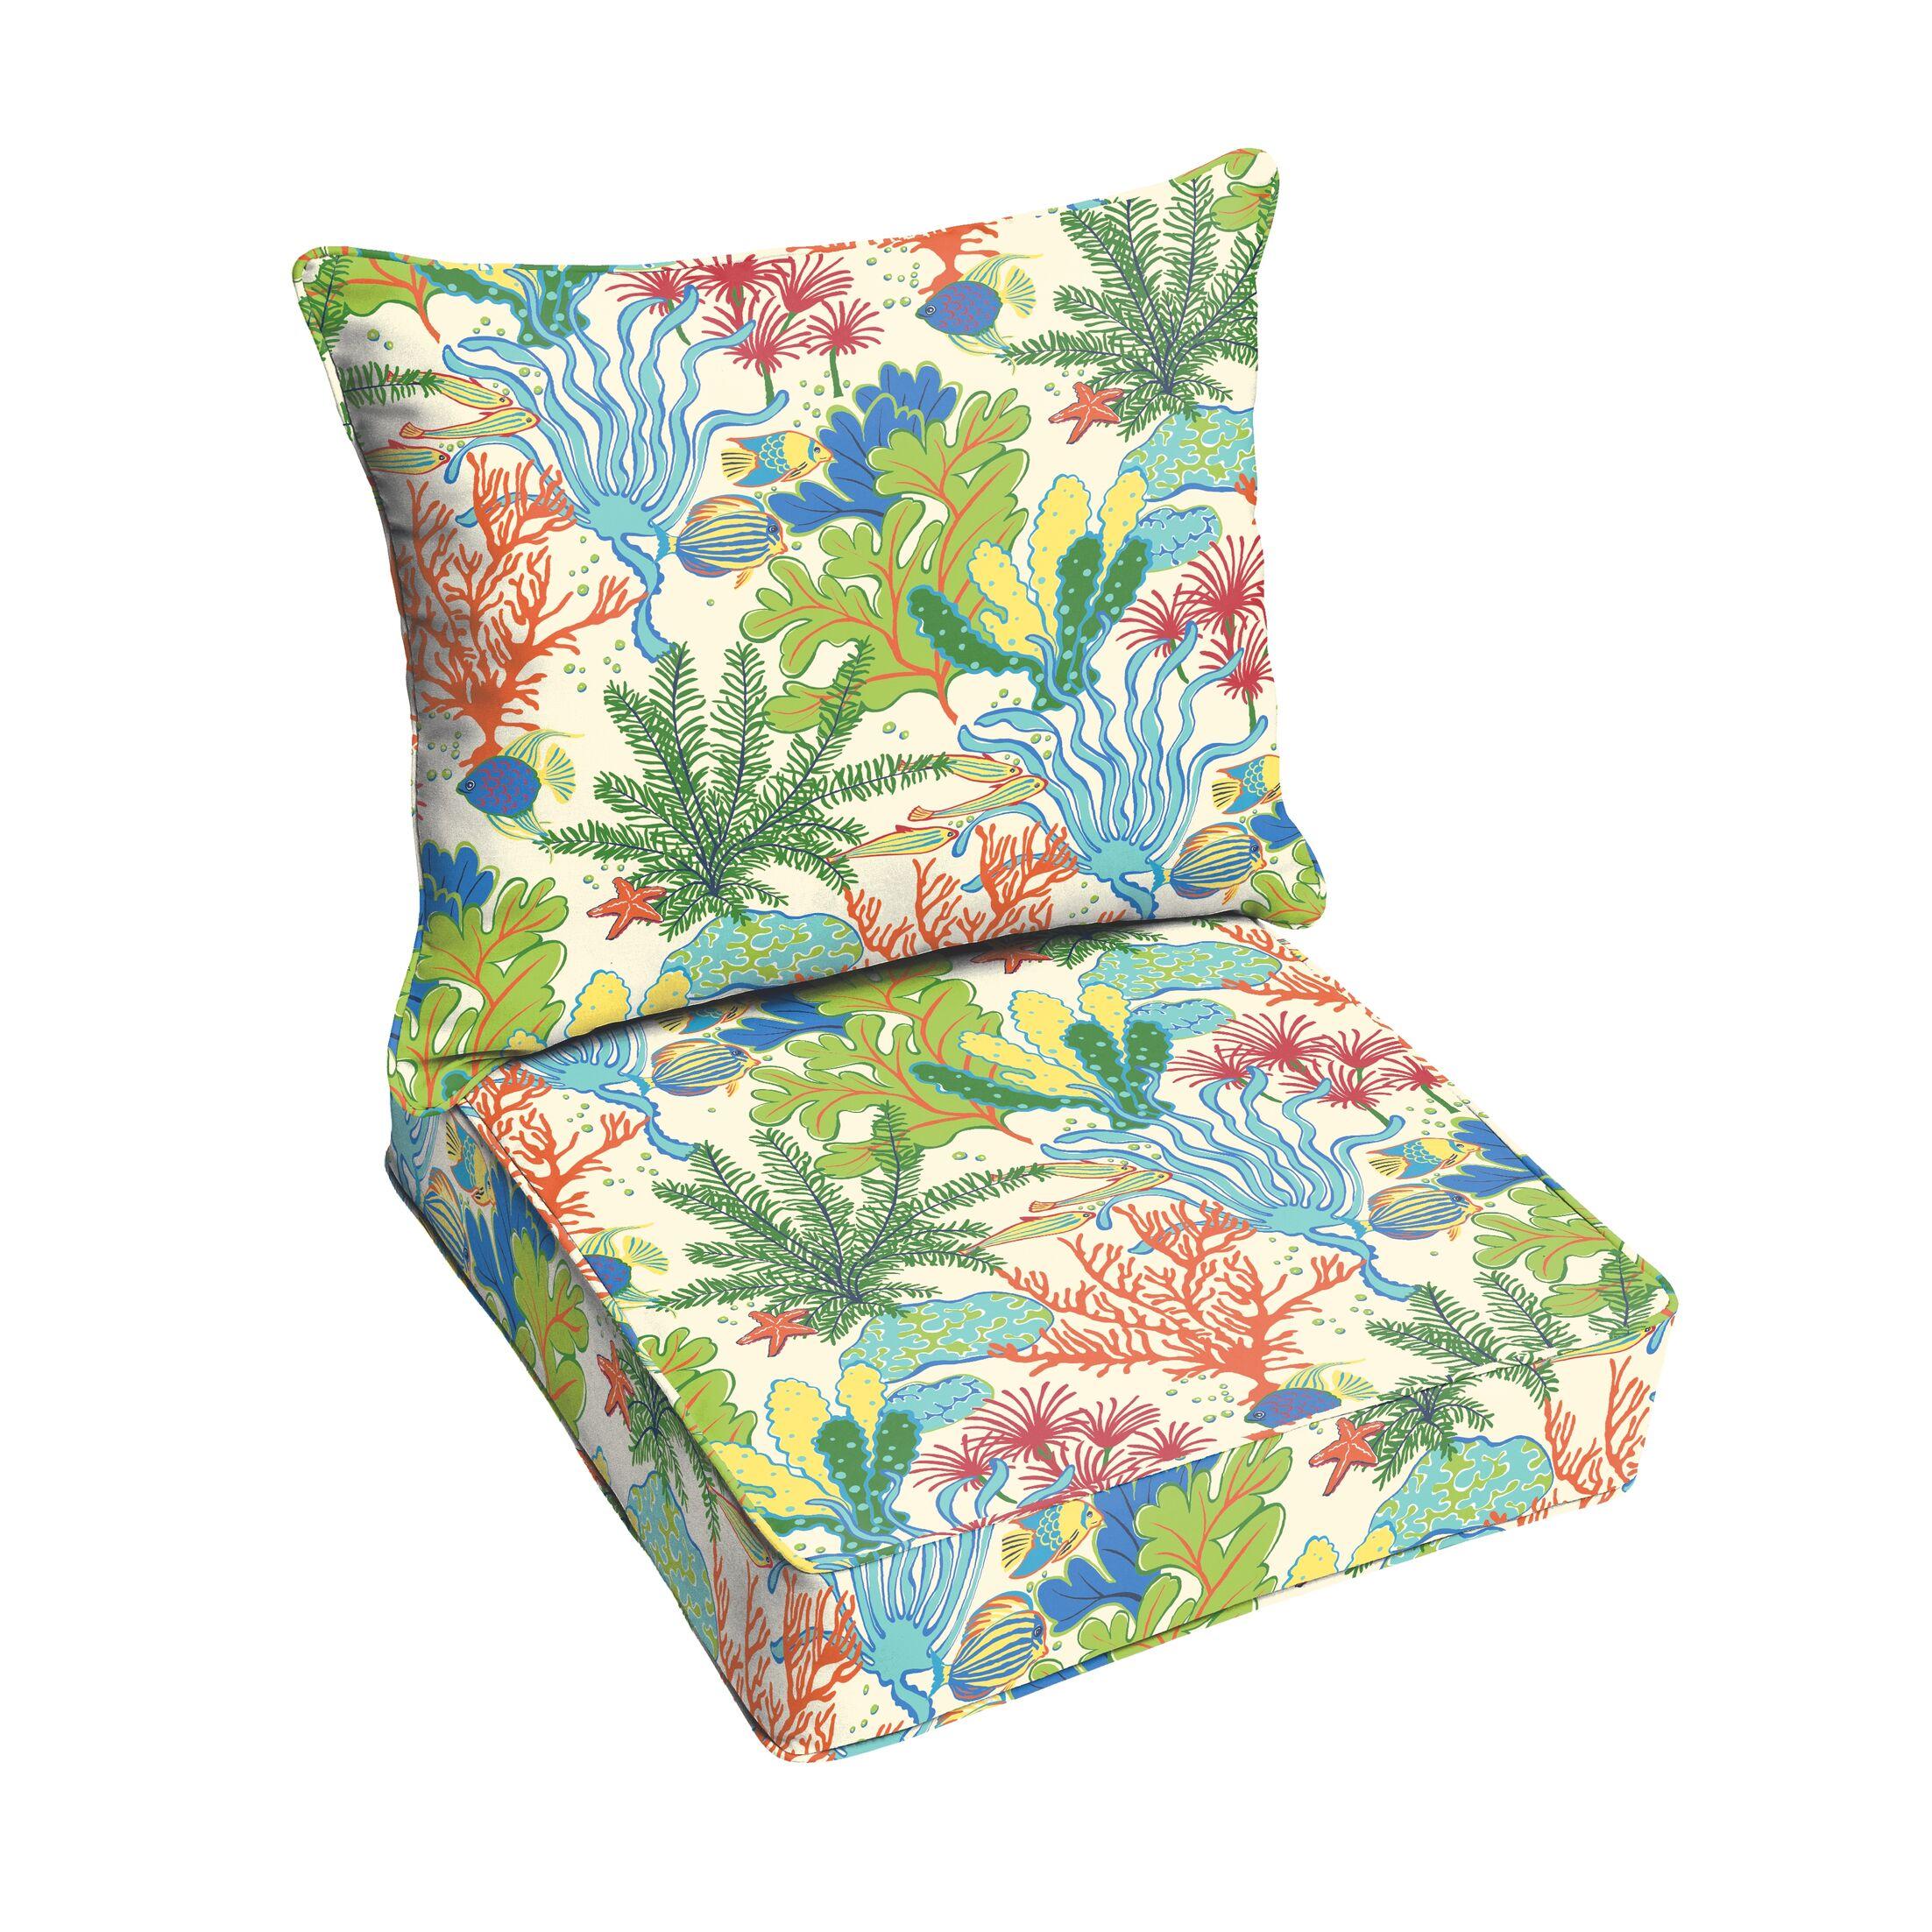 Evadne Indoor/Outdoor Lounge Chair Cushion